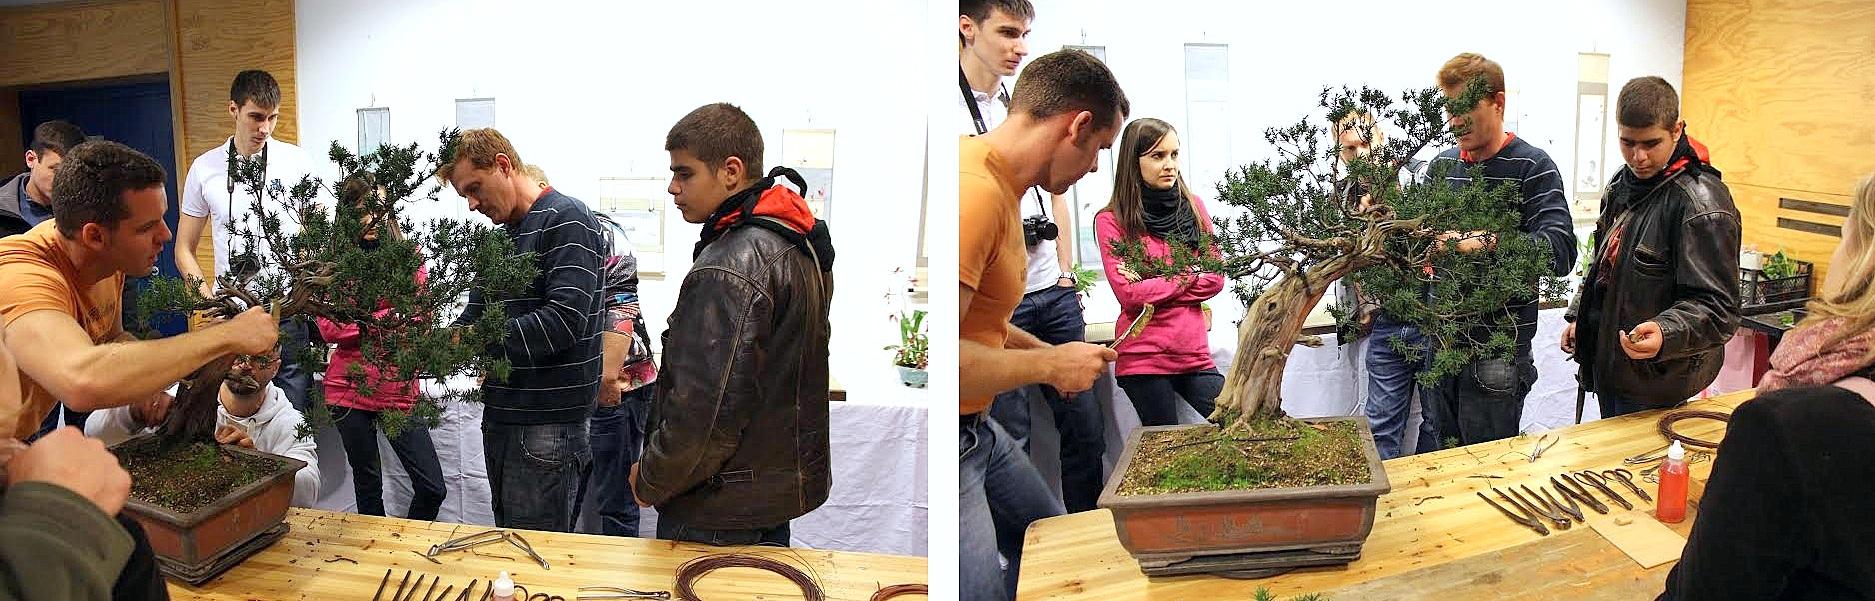 taxus cuspidata pre bonsai alakitasa bonsai demo alatt papp sandor bonsai mester altal az egyetemi bonsai club kiallitasan